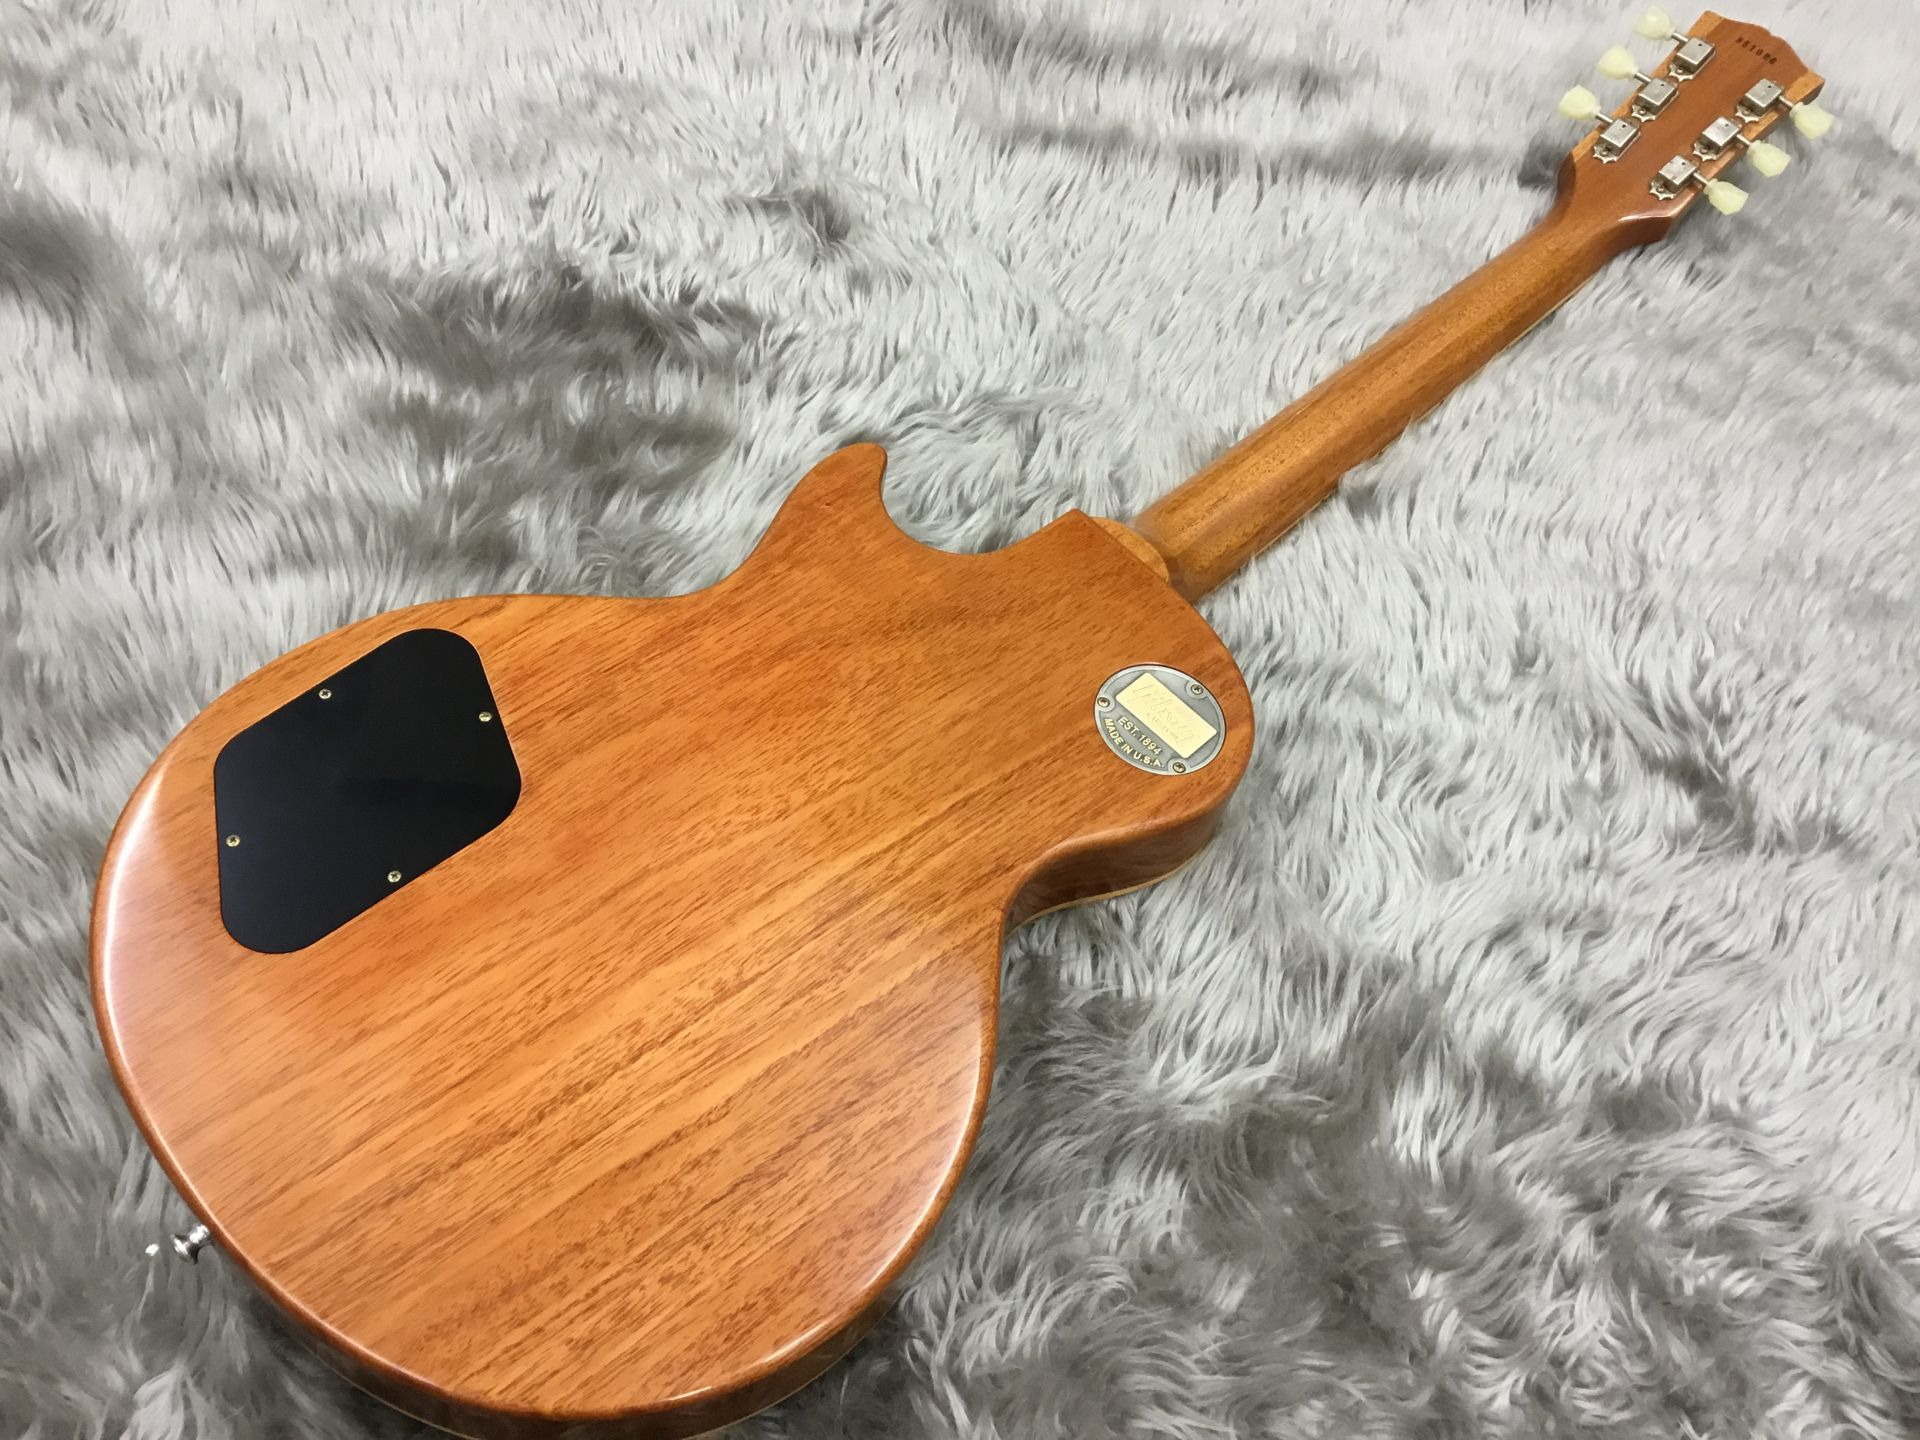 2017 Limited Run 1958 Les Paul Model Hard Rock Maple VOSのヘッド裏-アップ画像